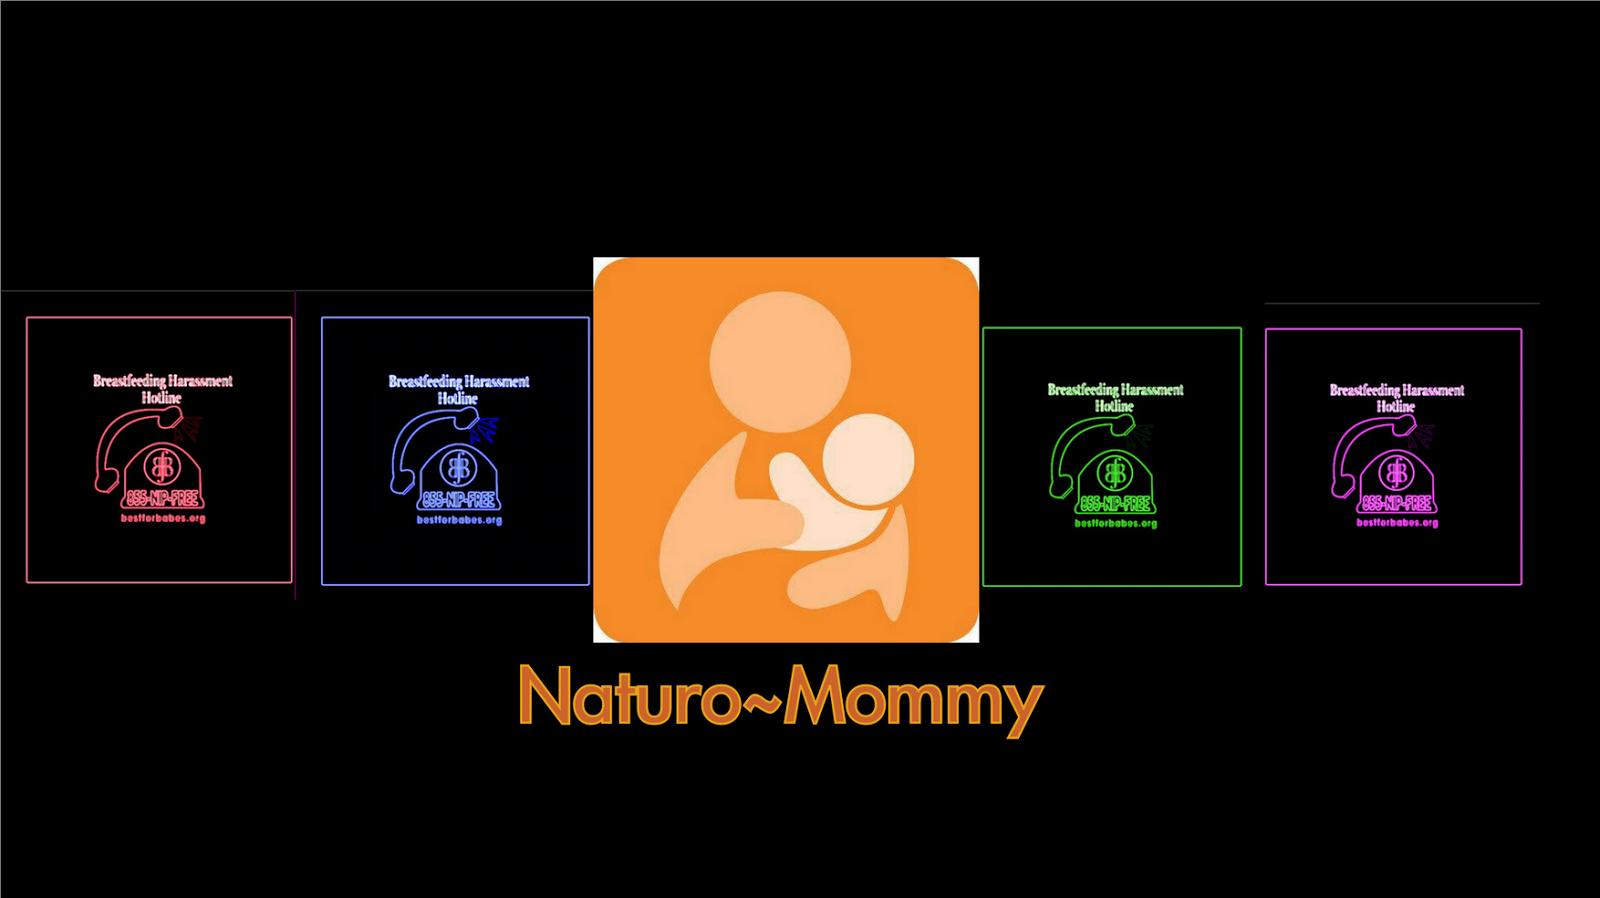 Naturo-Mommy